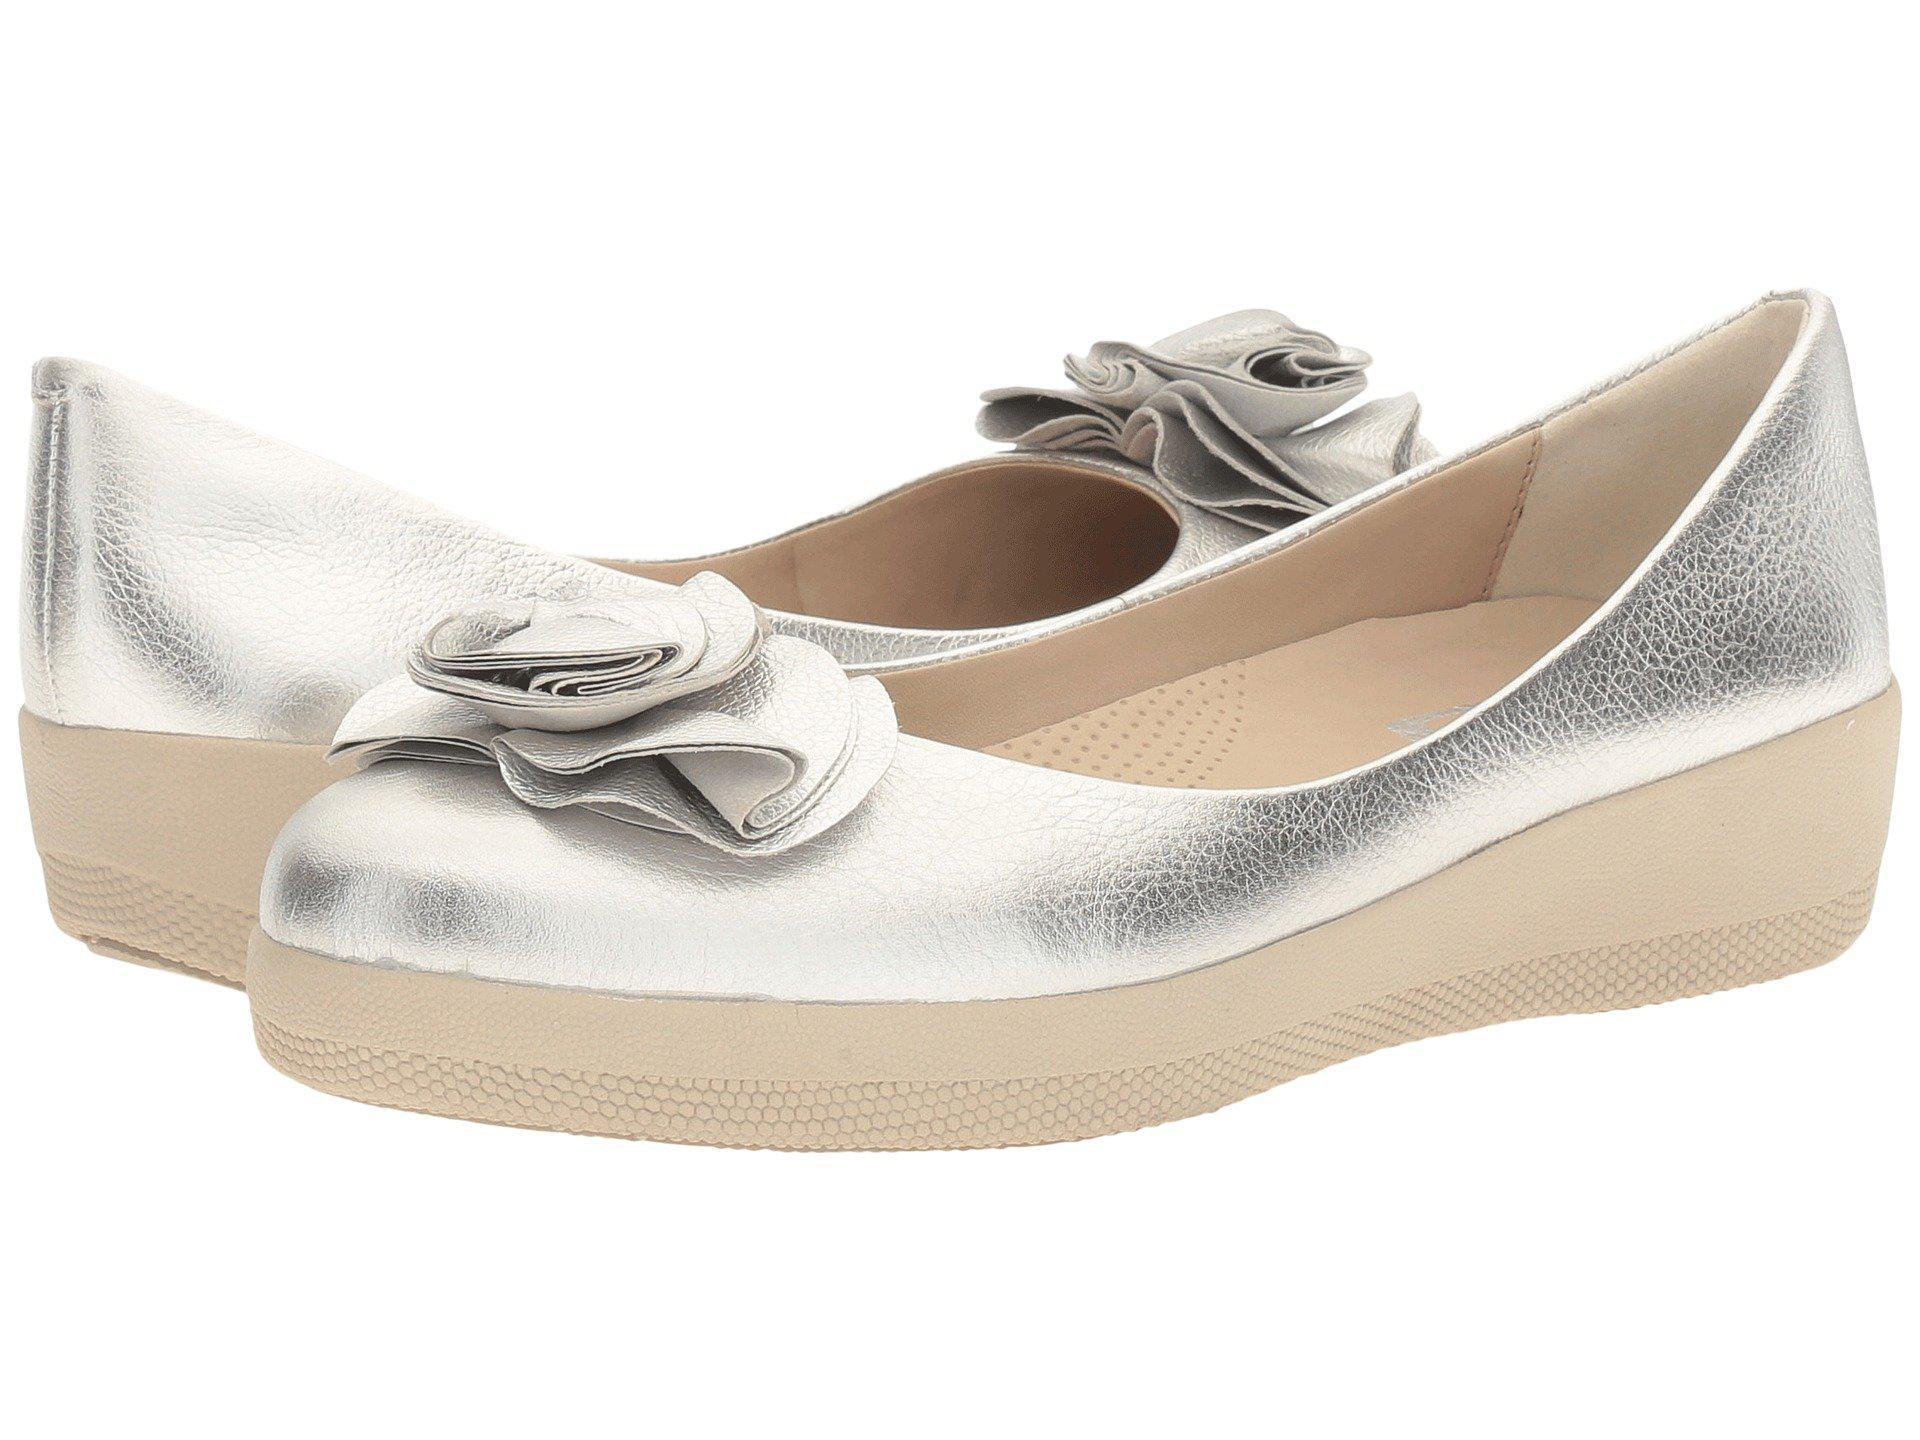 8253c7a10d0512 Lyst - Fitflop Florrie Superballerina Ballet Flat in Metallic - Save 45%